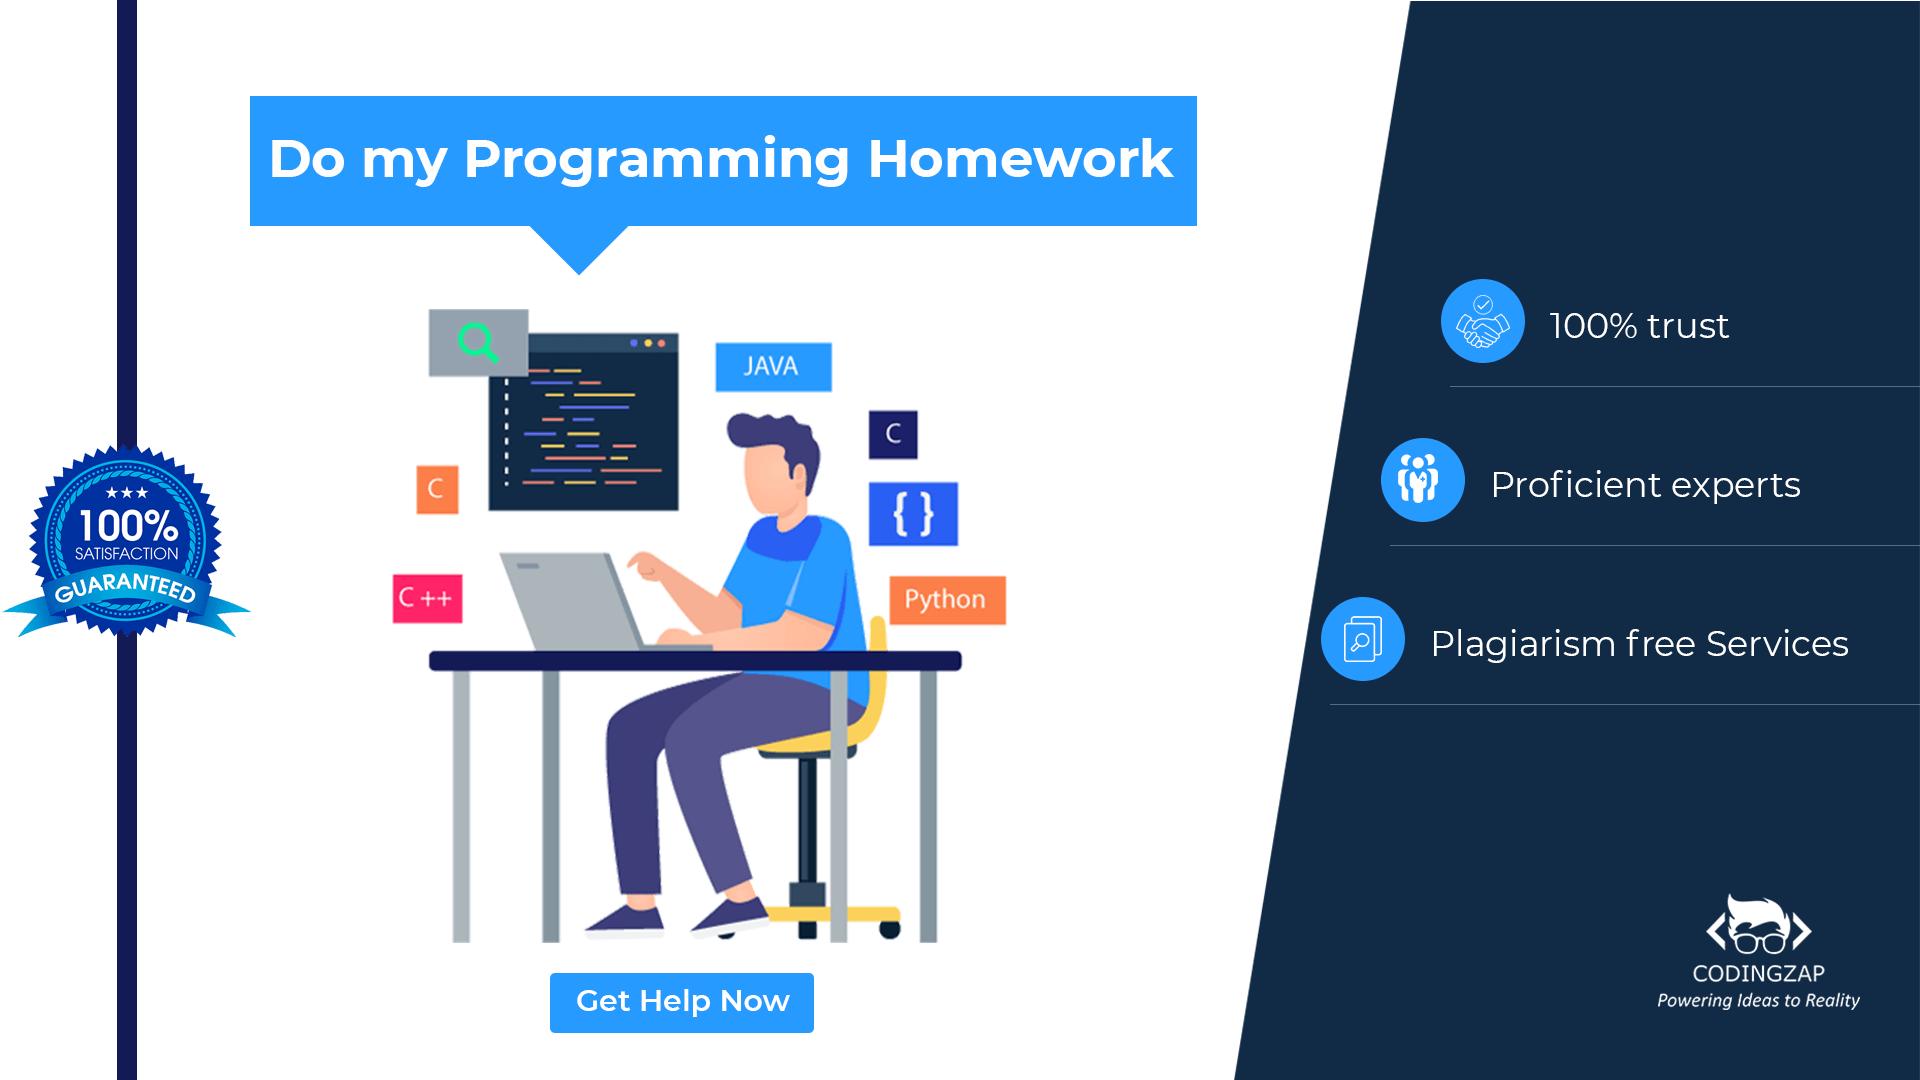 Do my Programming Homework